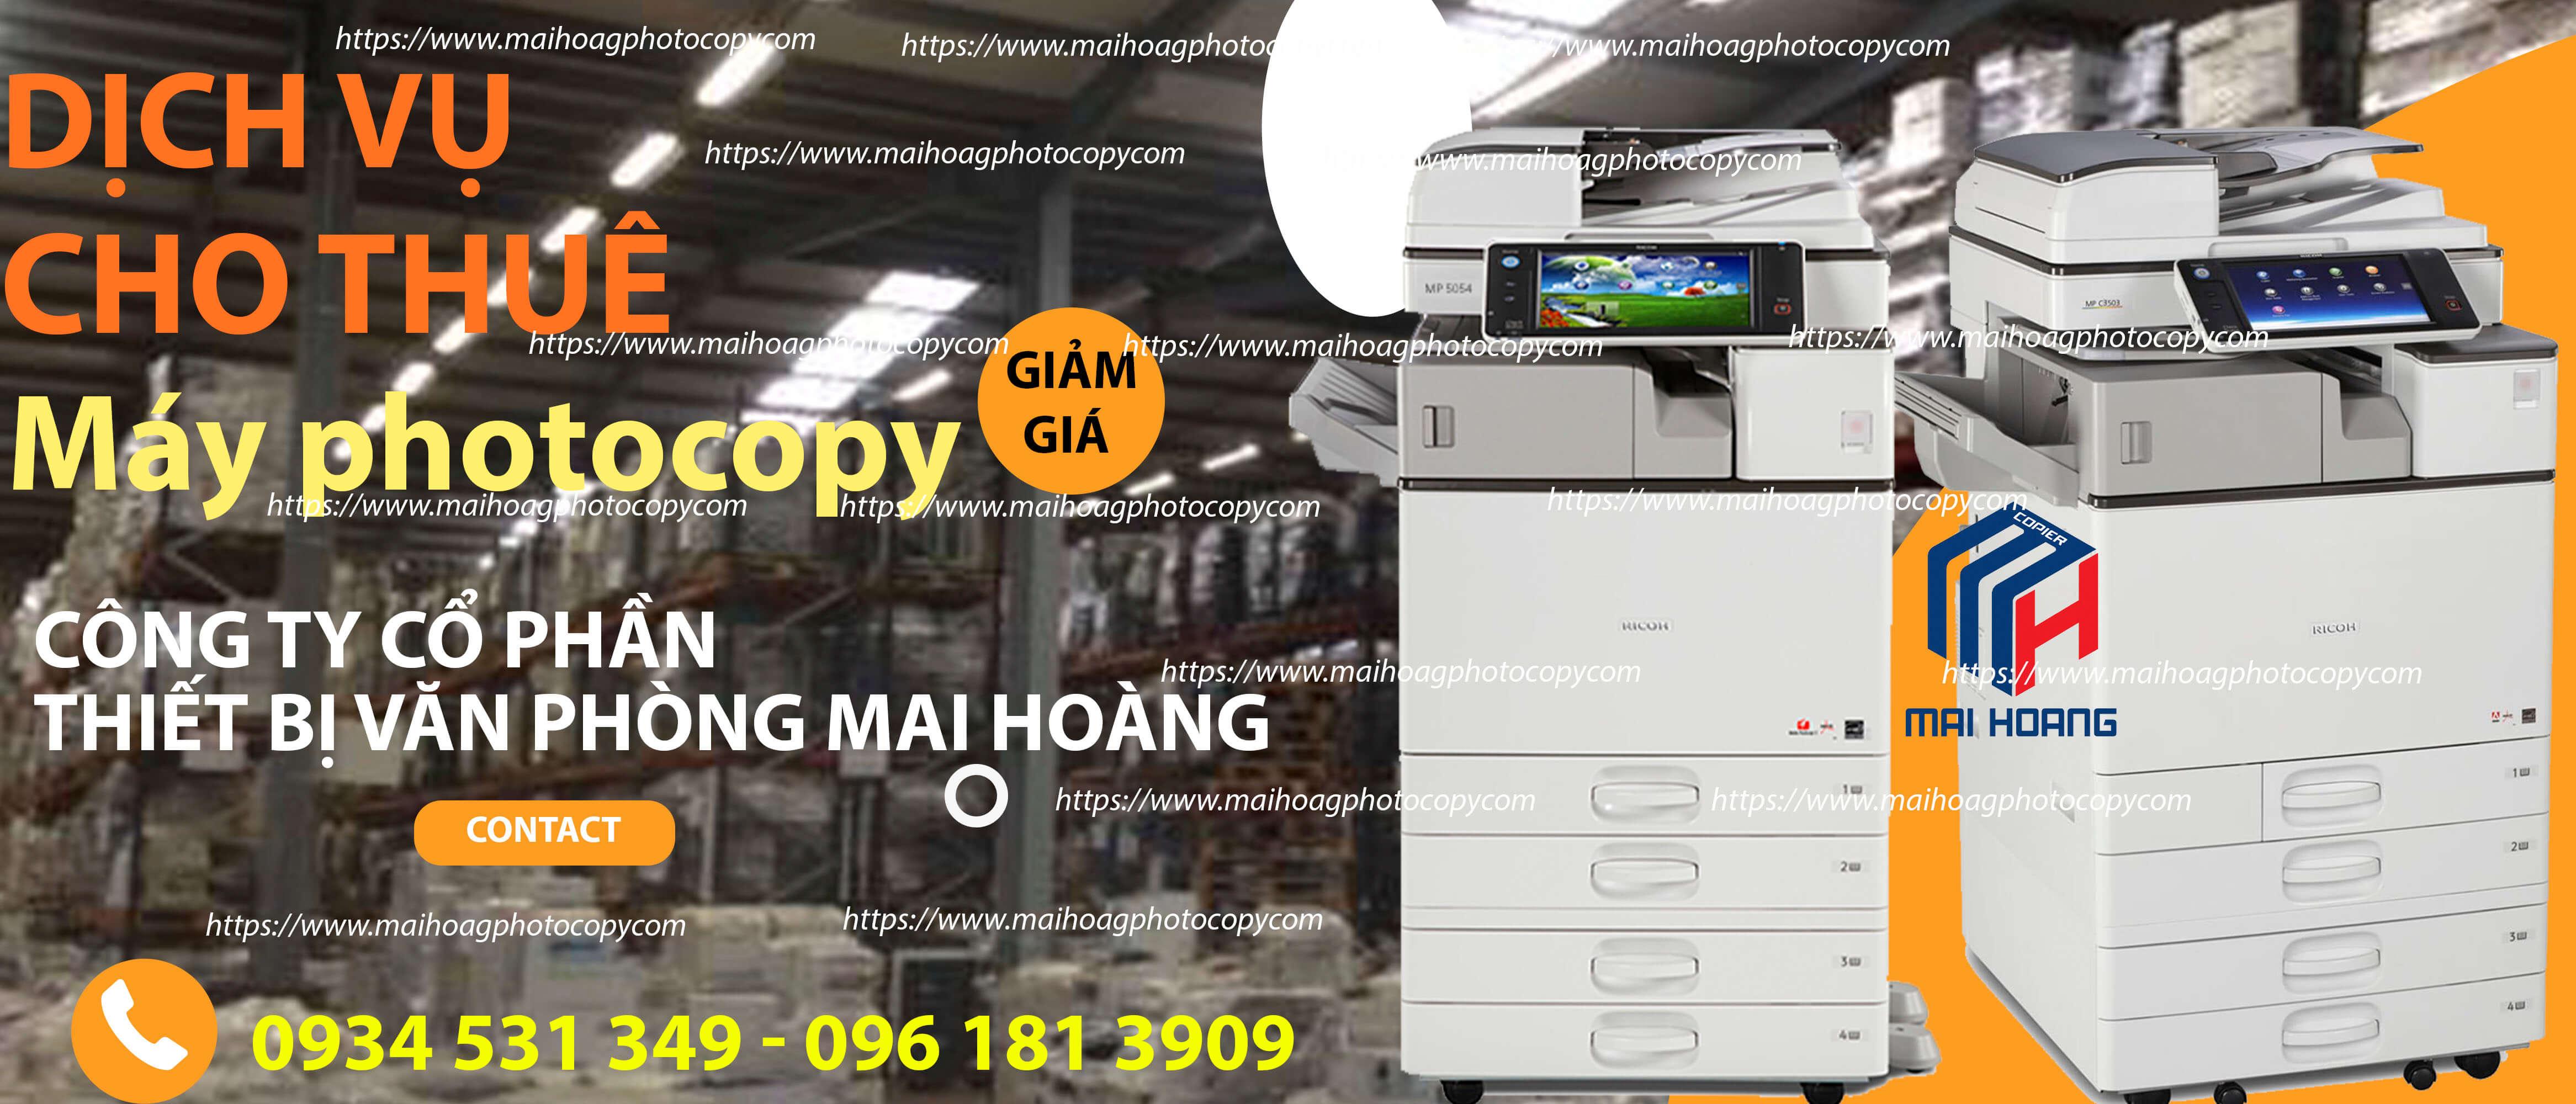 giá Cho Thuê Máy Photocopy Màu Đa Chức Năng Ricoh Aficio MP C3503